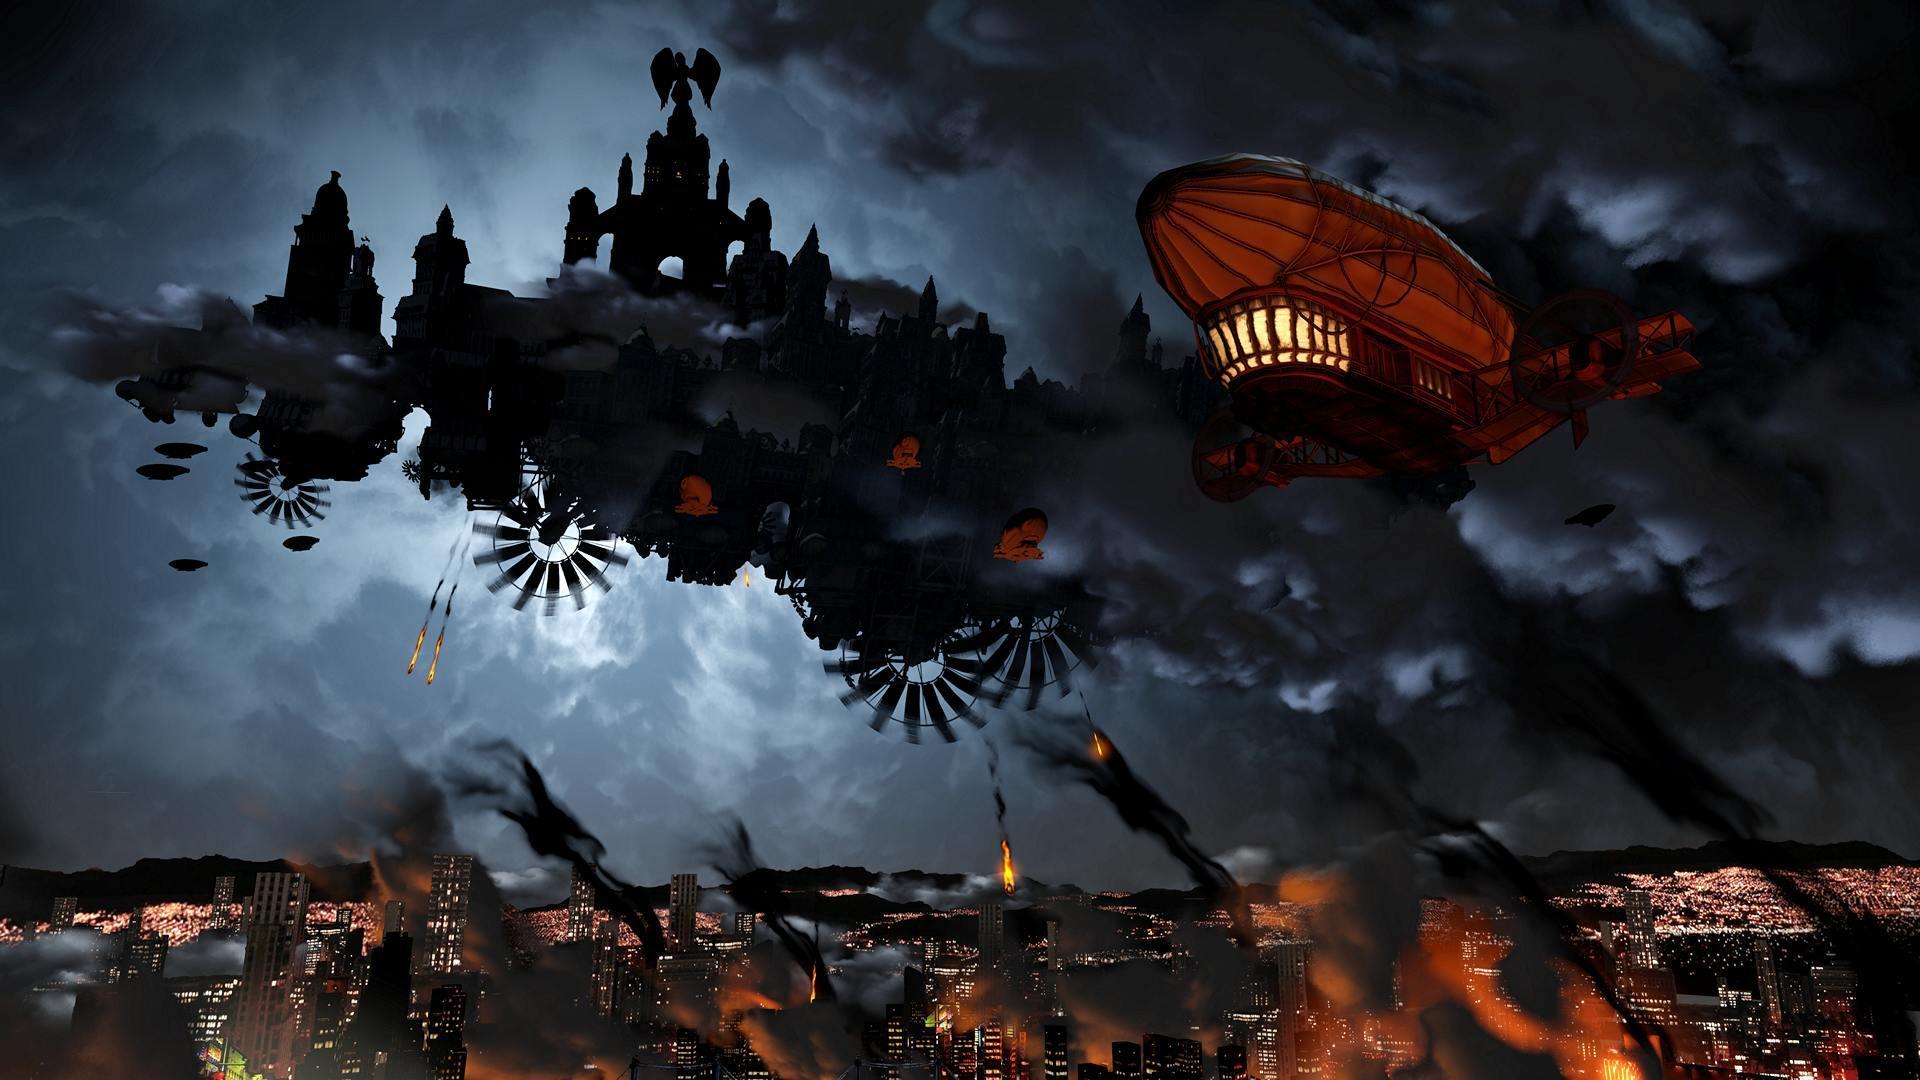 Bioshock Infinite Wallpapers [HD] Taringa 1920x1080